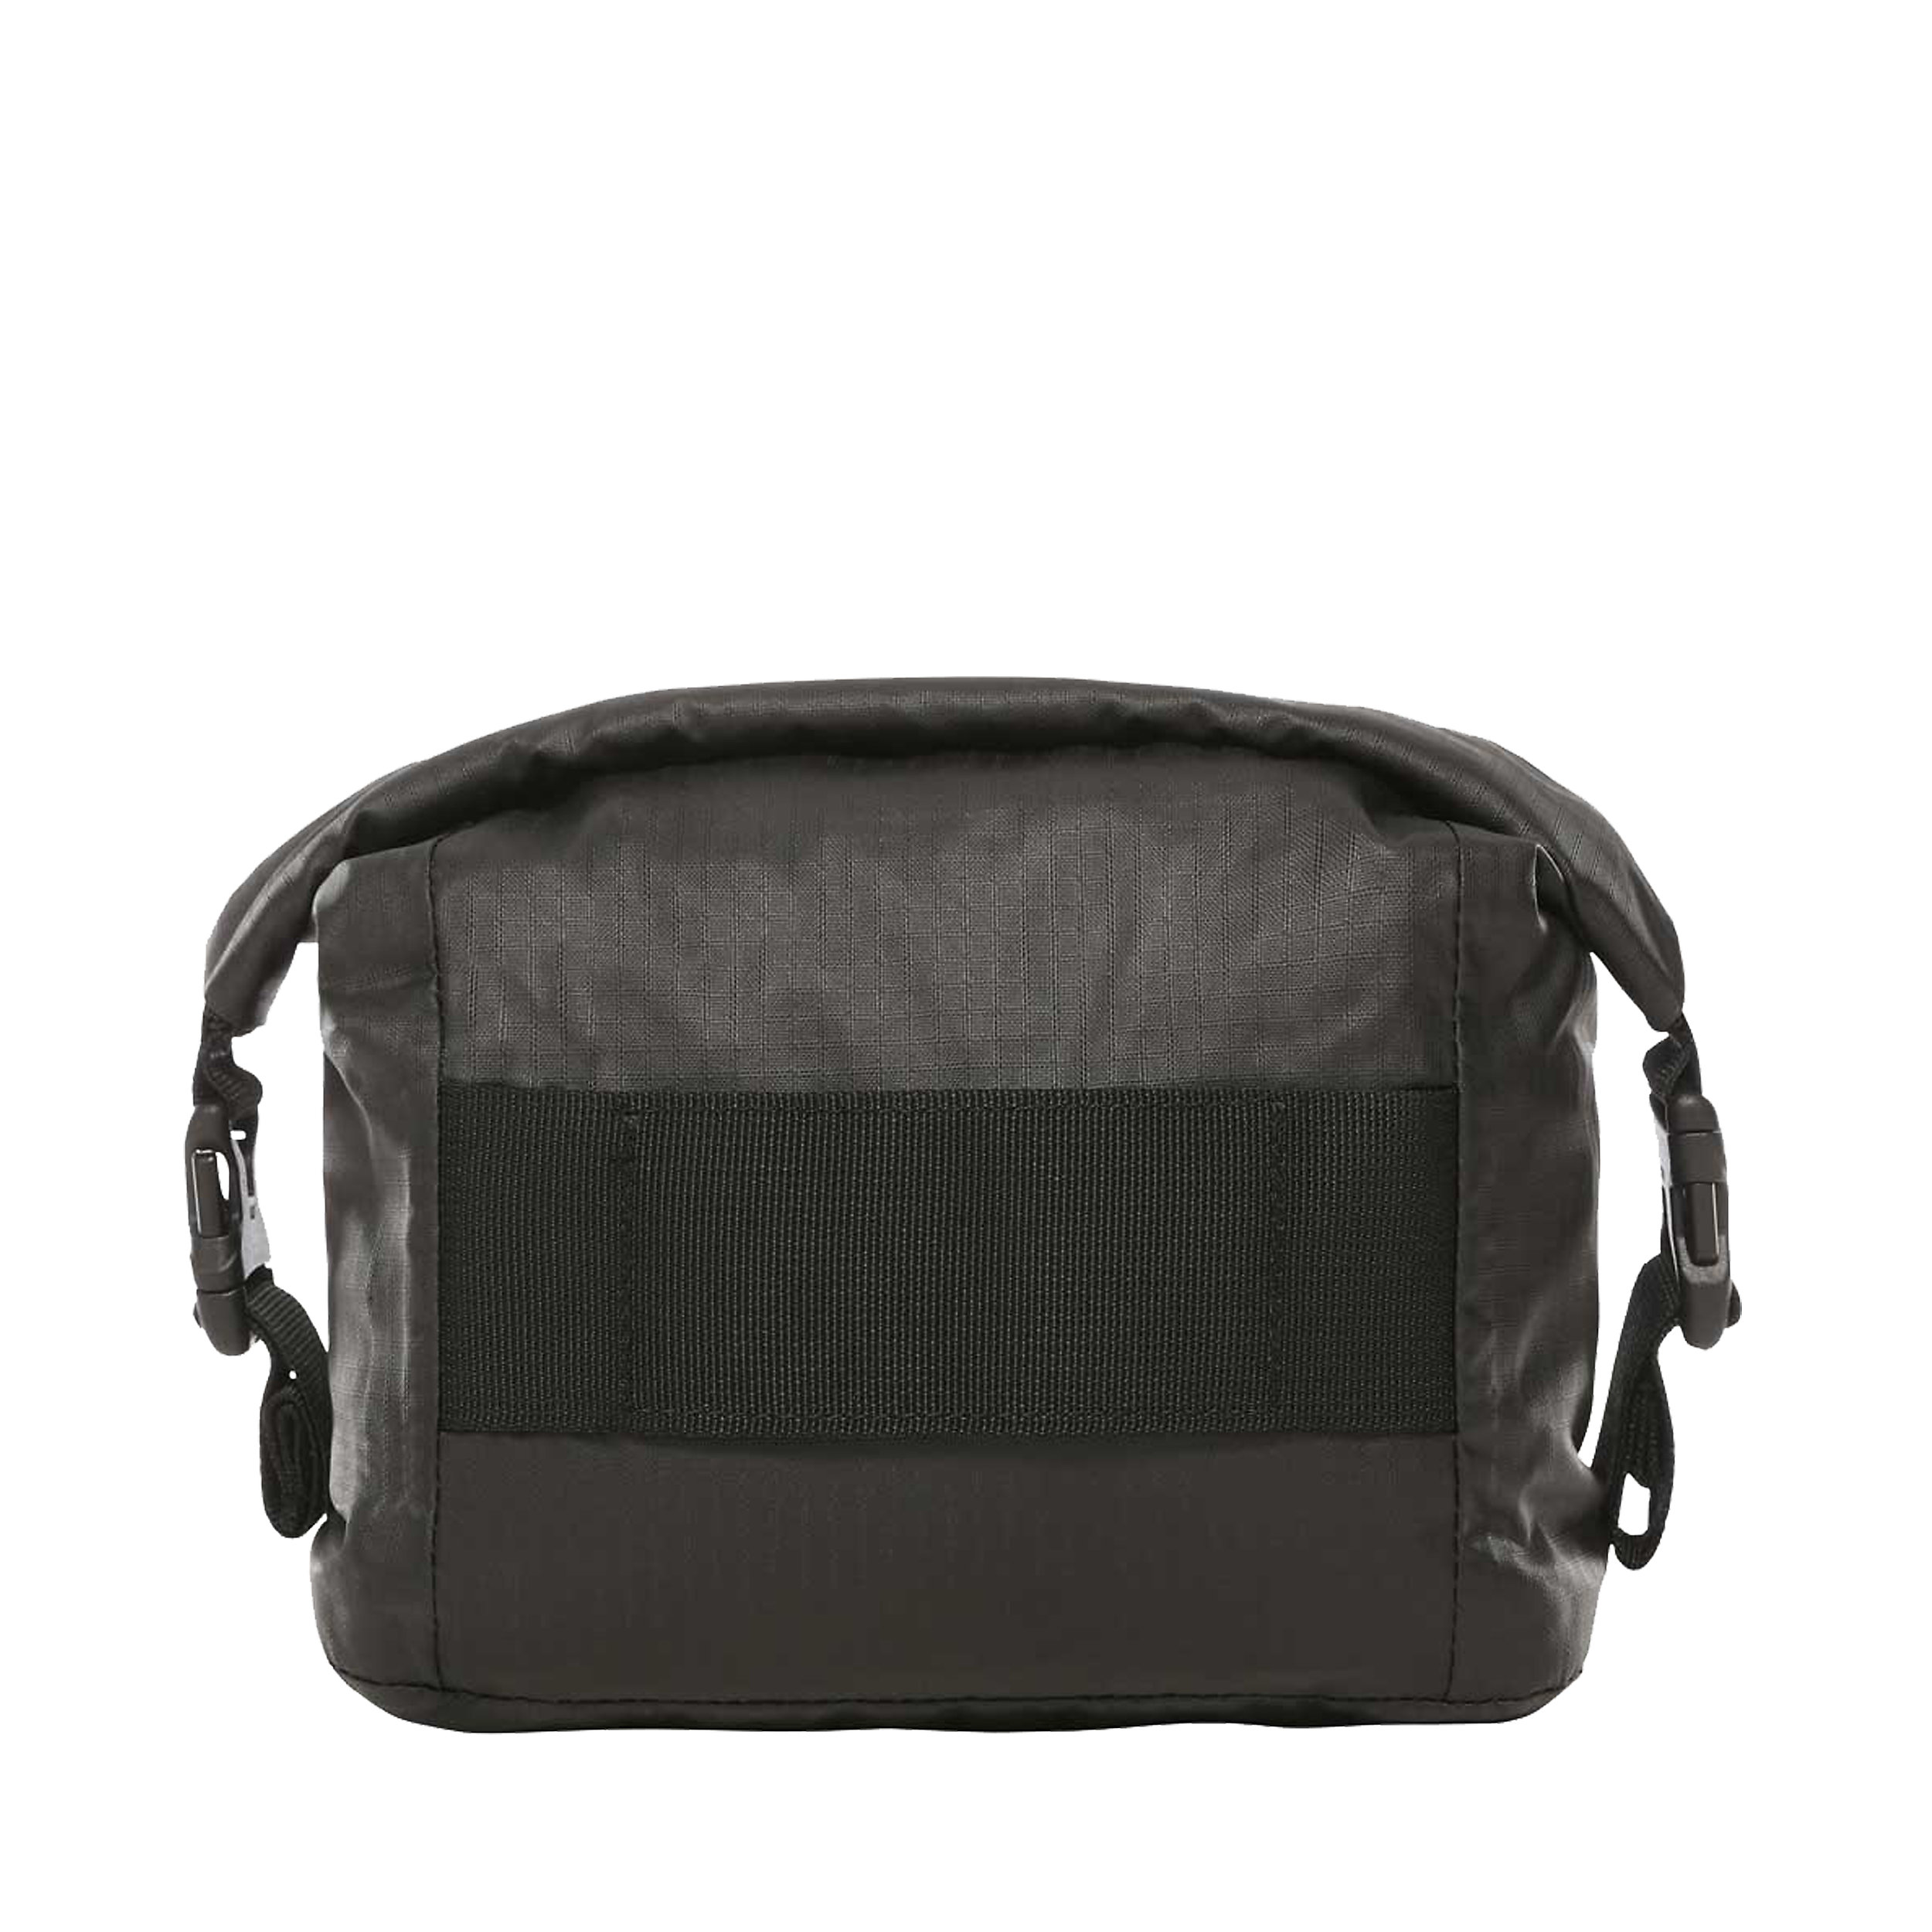 Hip Bag Lumbar waterproof S 4 Liter